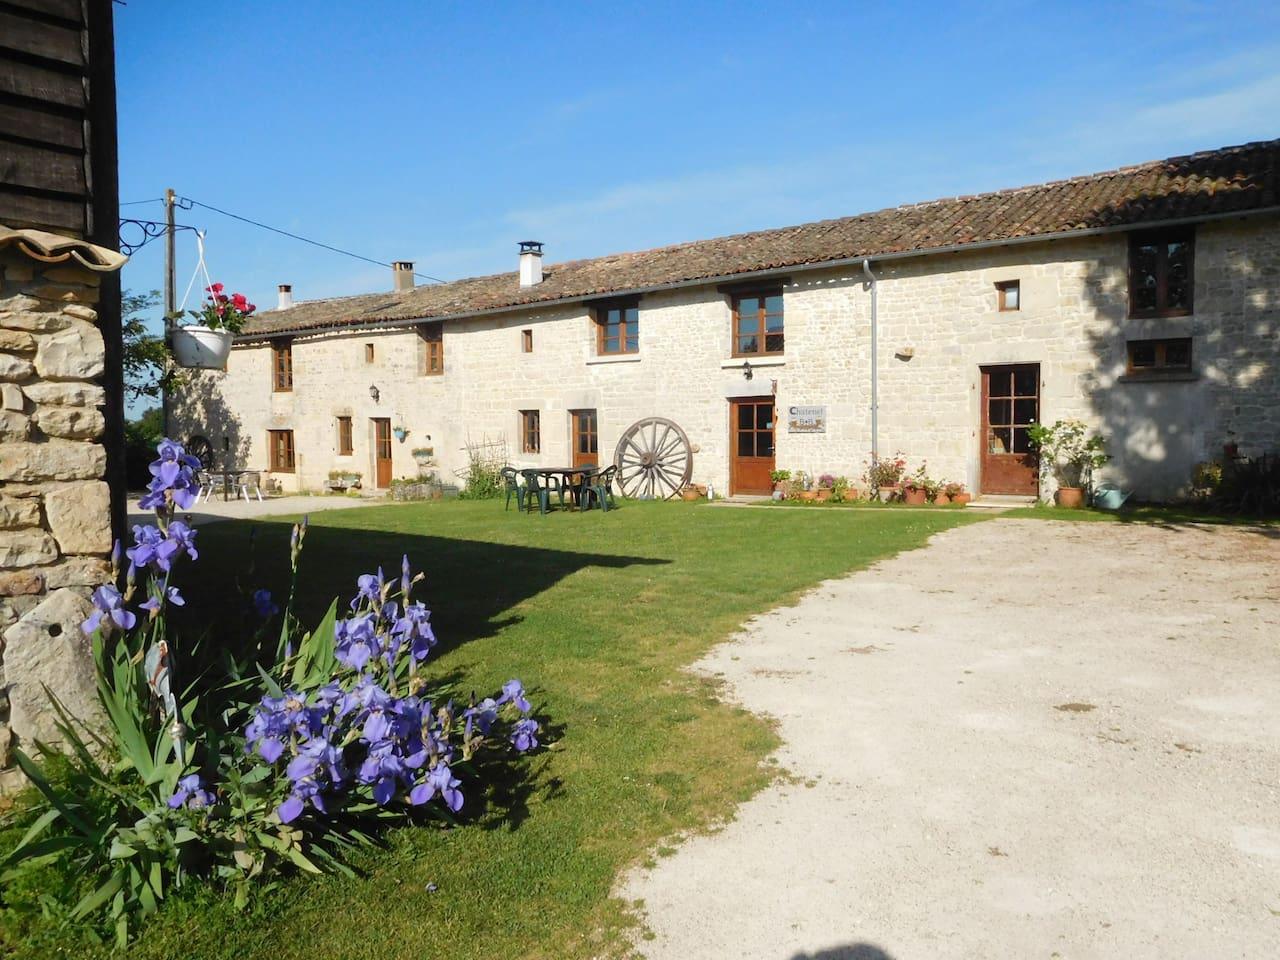 Lovely 300 year old stone Farmhouse